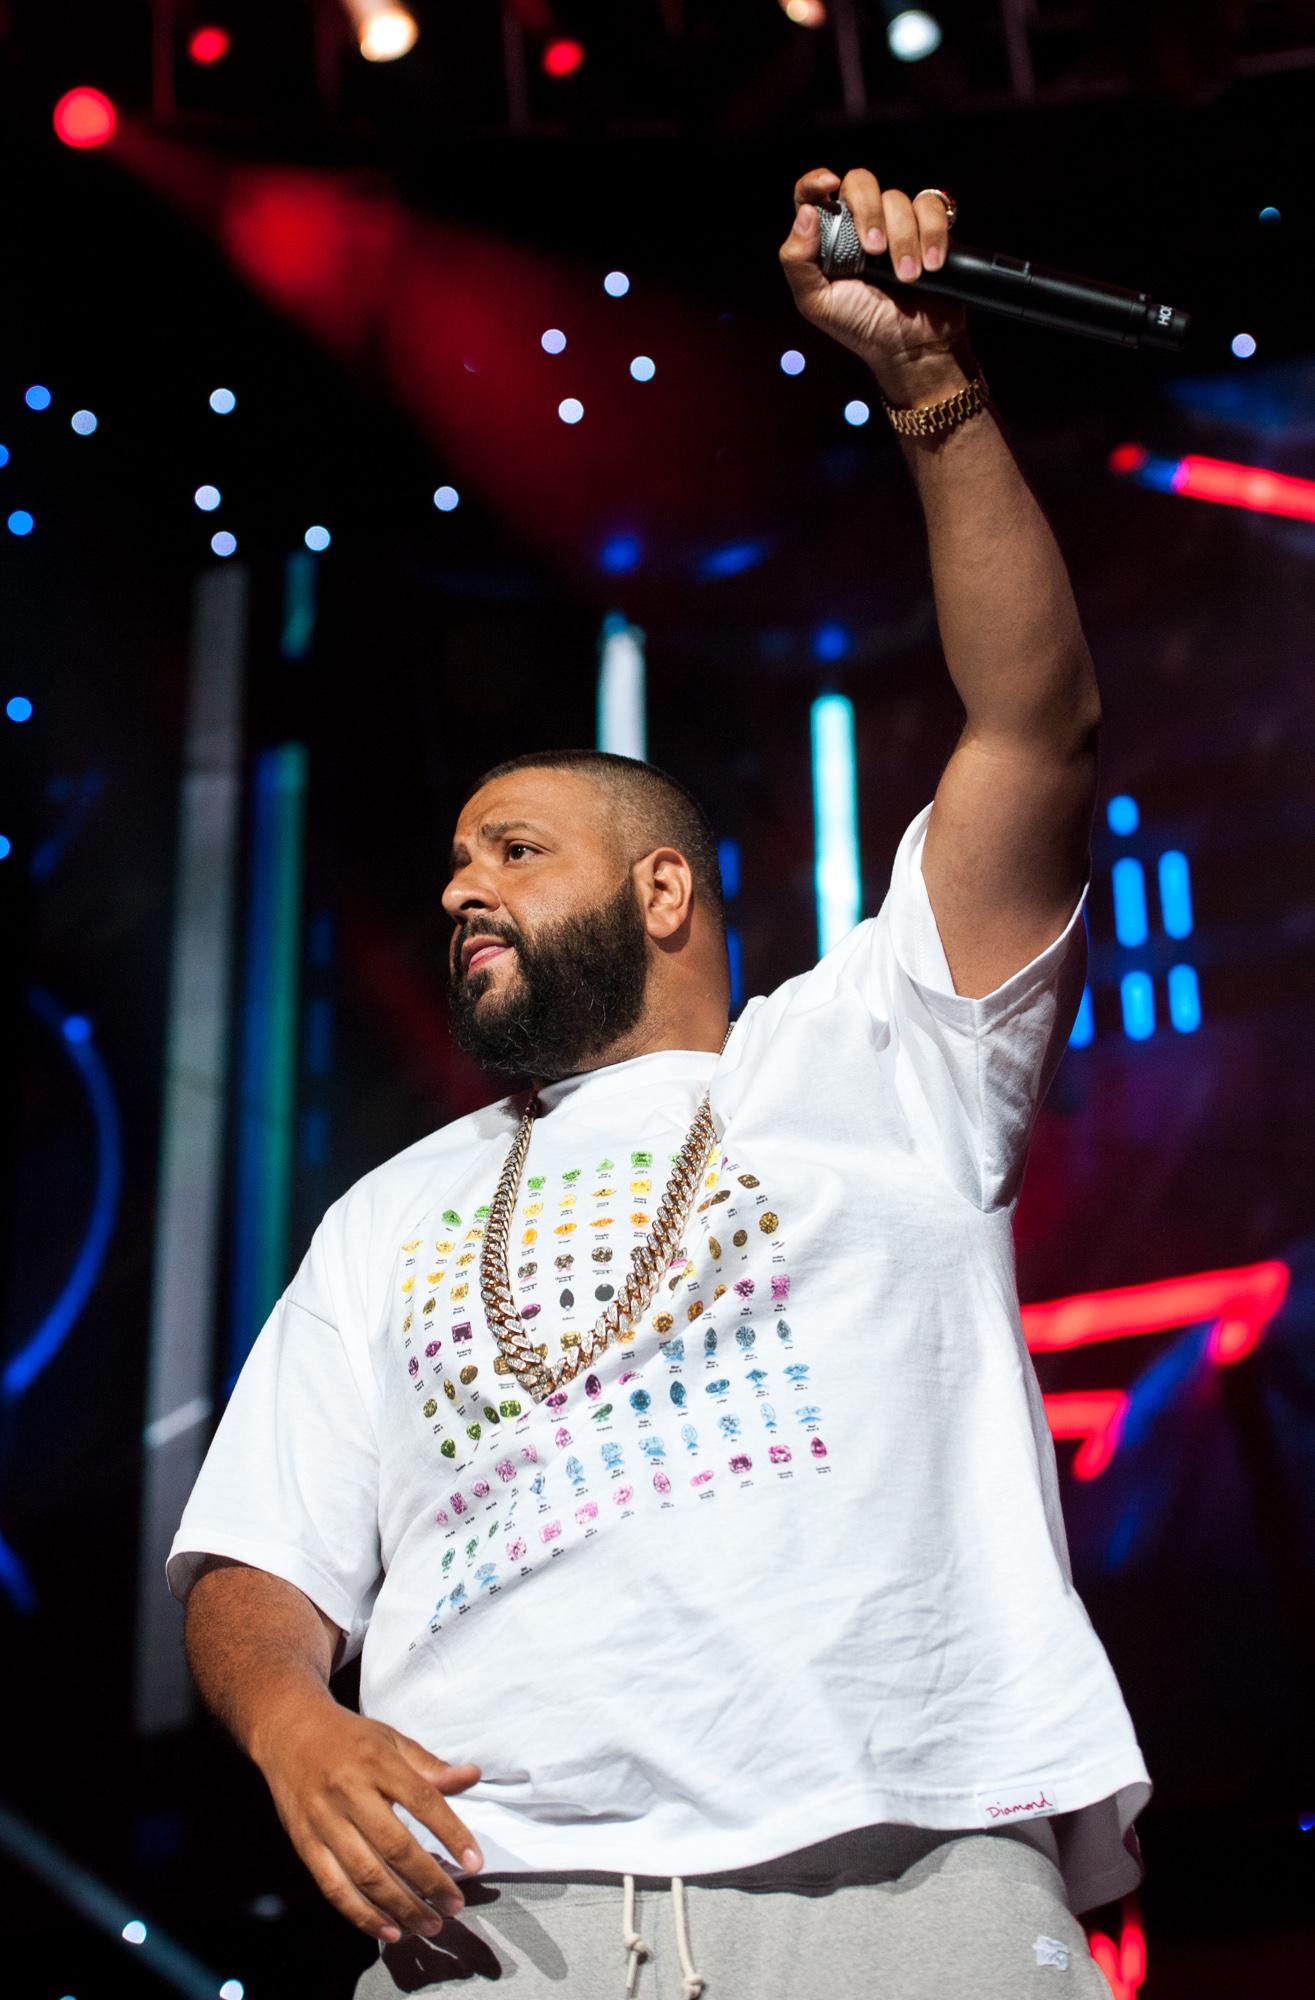 DJ Khaled @ Staples Center | 2014